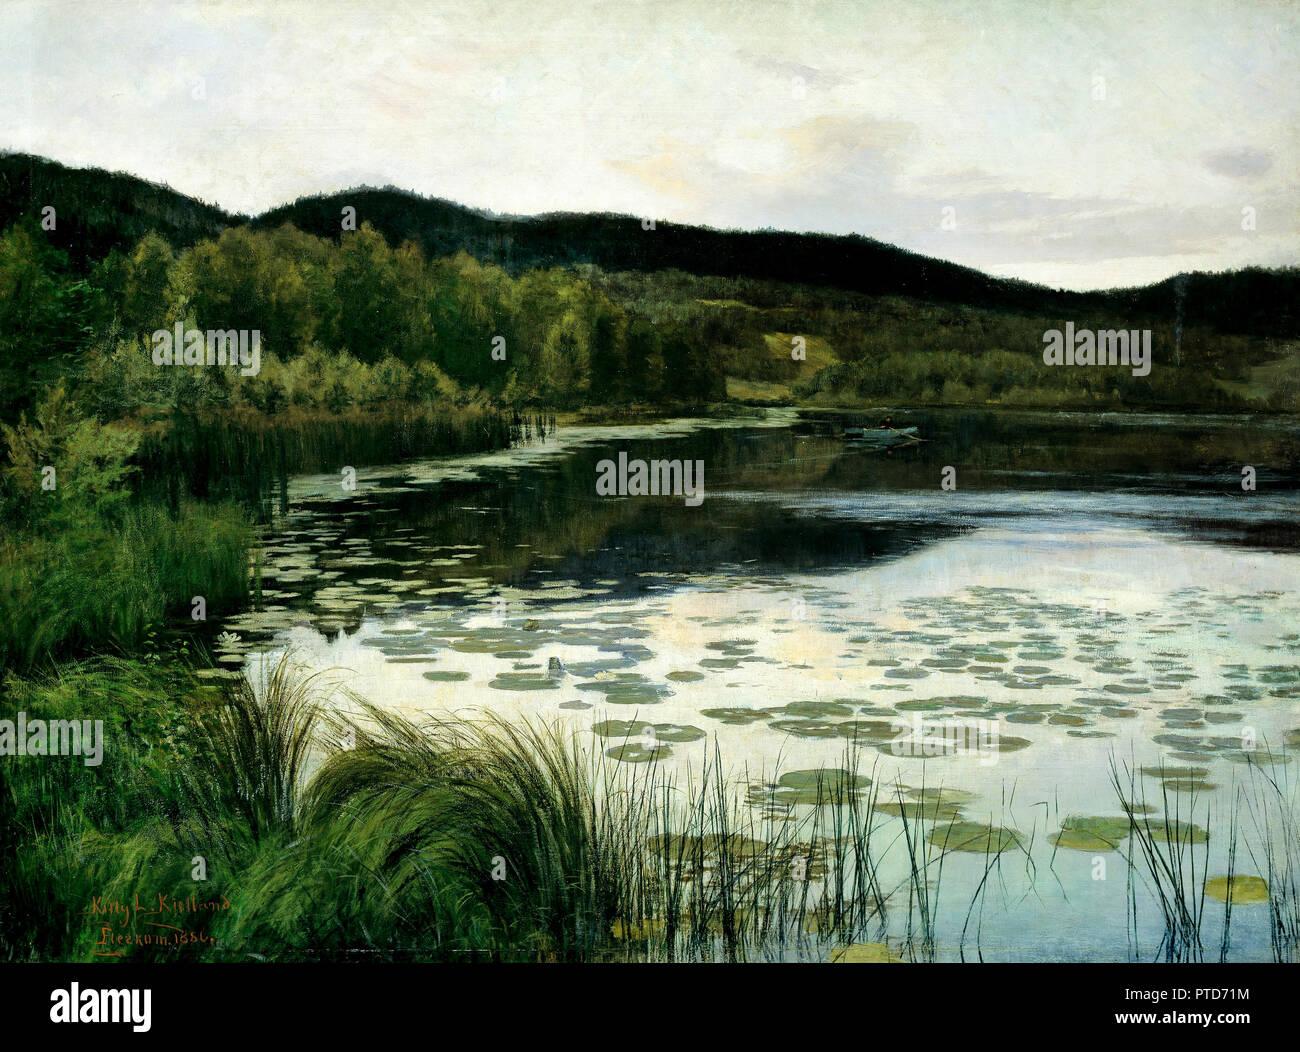 Kitty Lange Kielland, Summer Night 1886, Oil on canvas, National Gallery of Norway, Oslo, Norway. - Stock Image